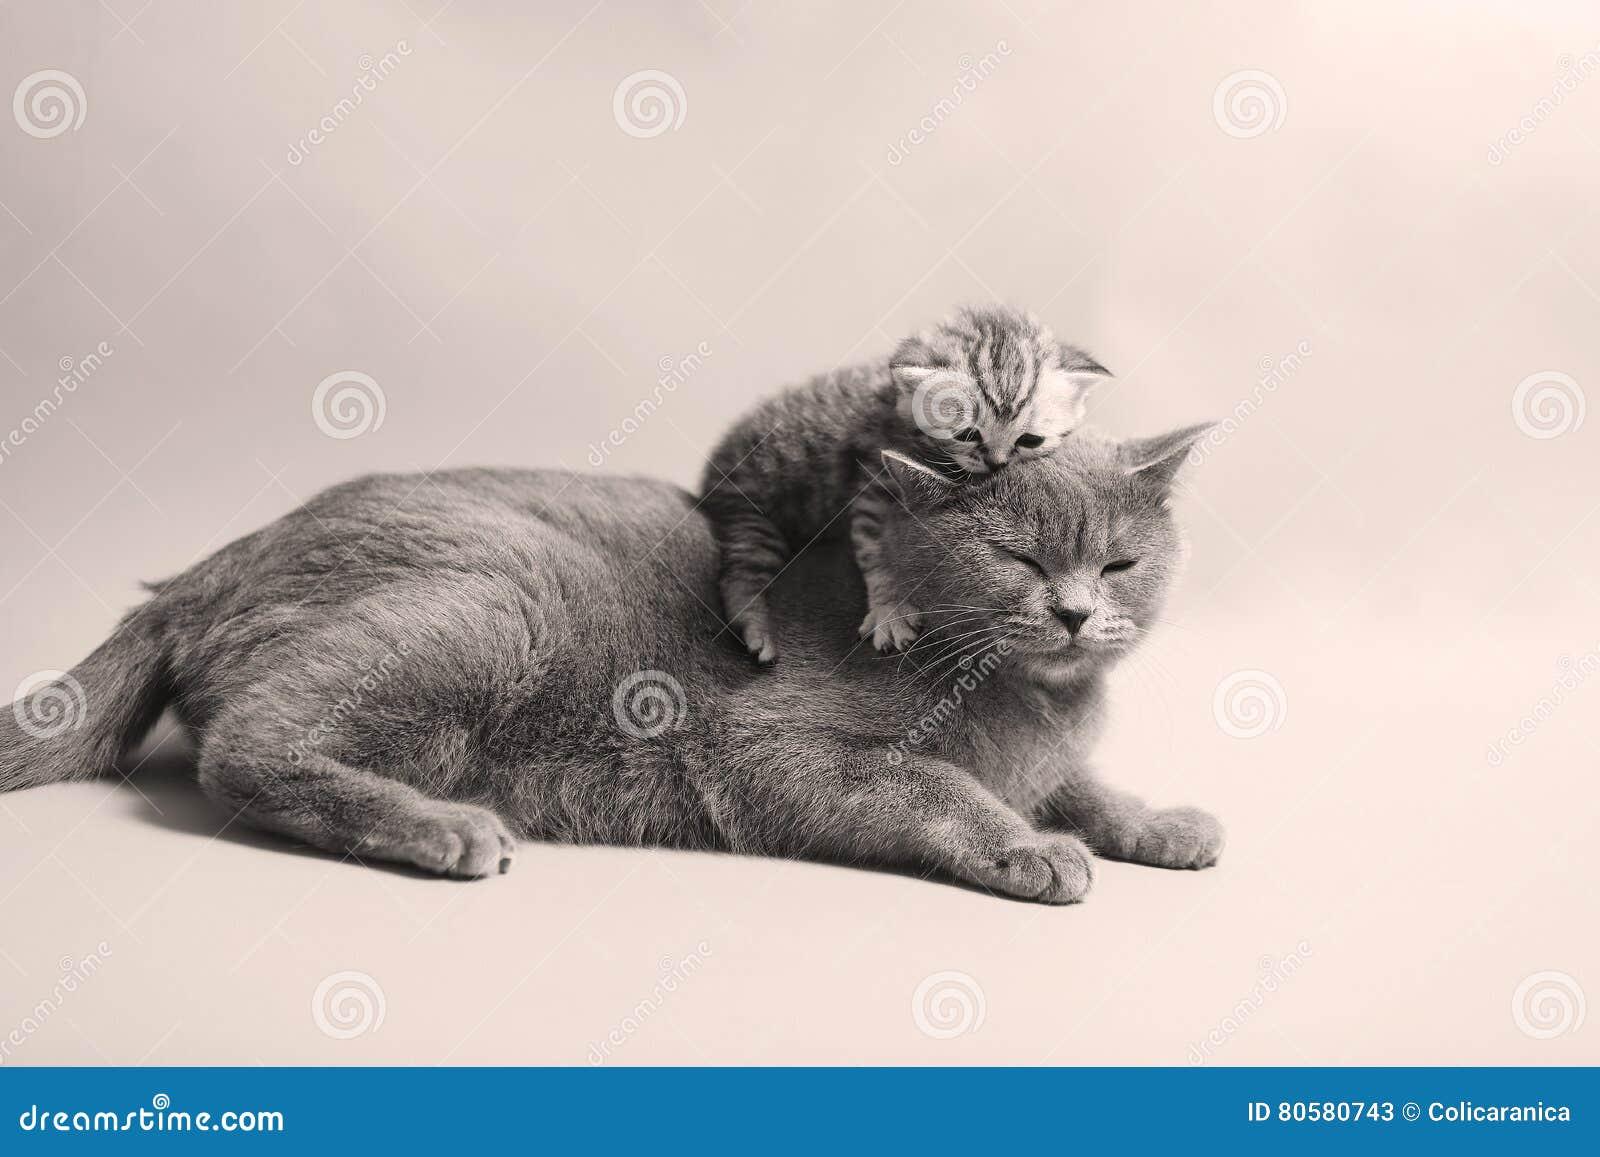 Cute newly born kitten